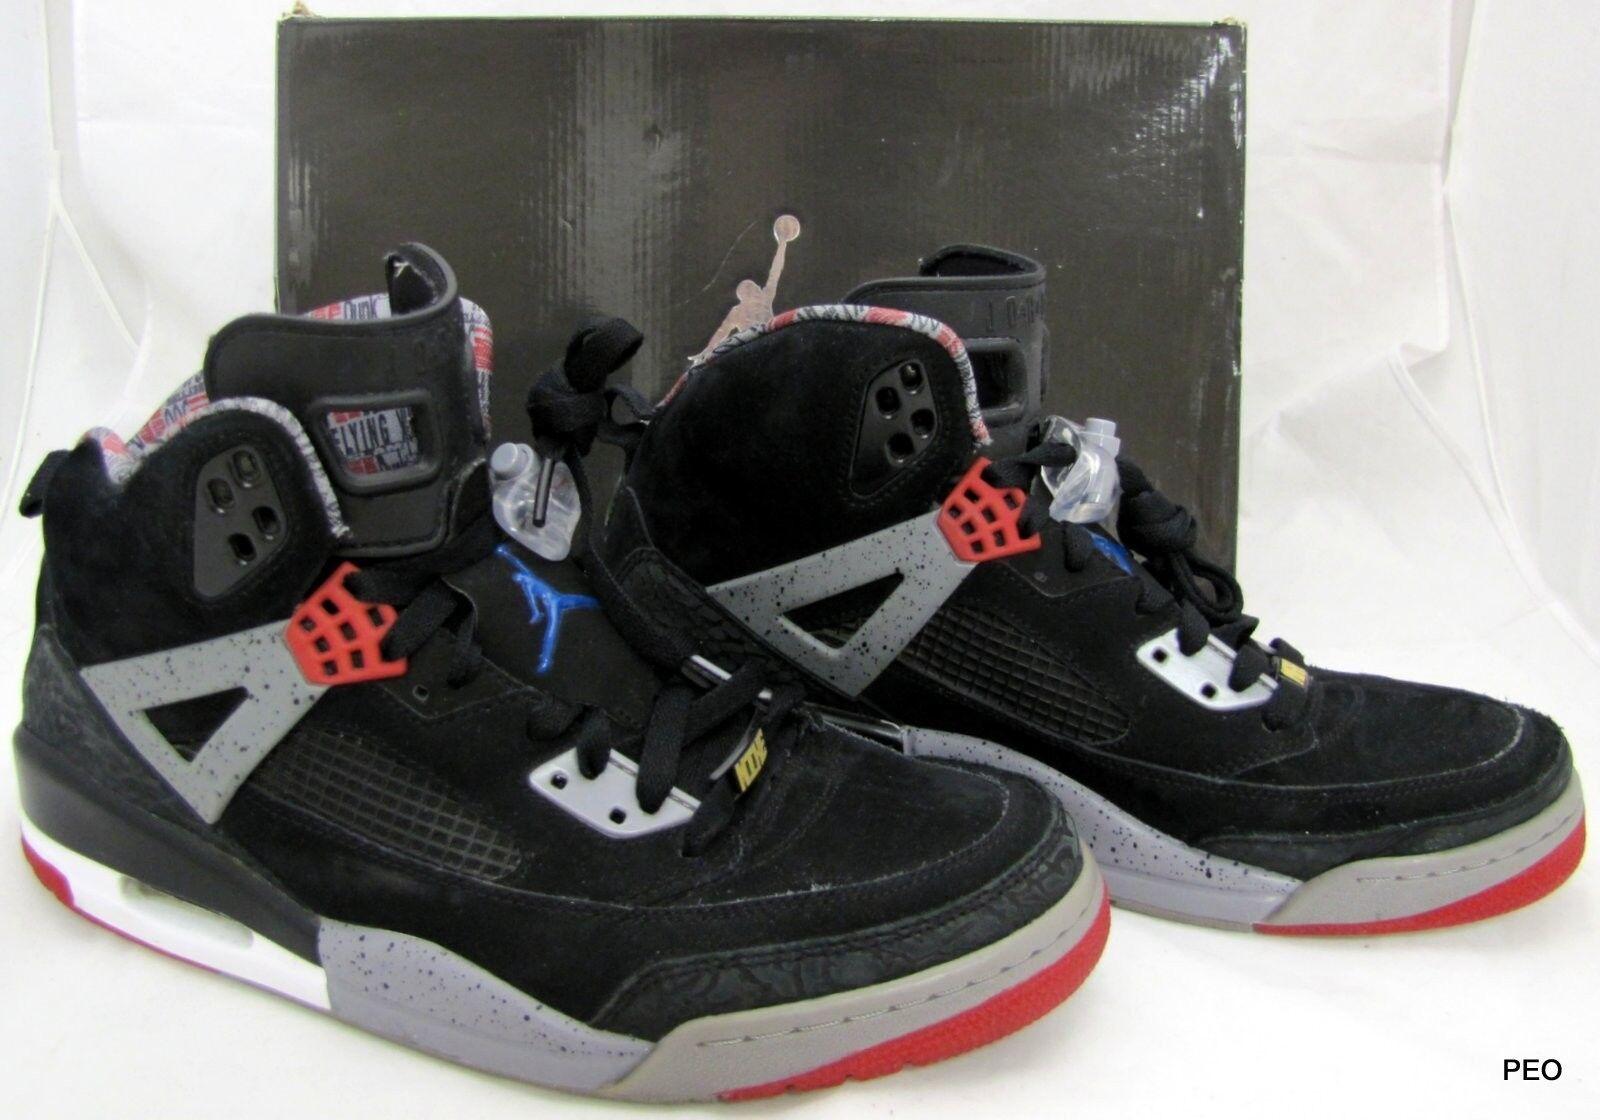 Nike Air Jordan Spizike Mens Sz 10.5 Black/Red/Gray Basketball Shoes 315371-062